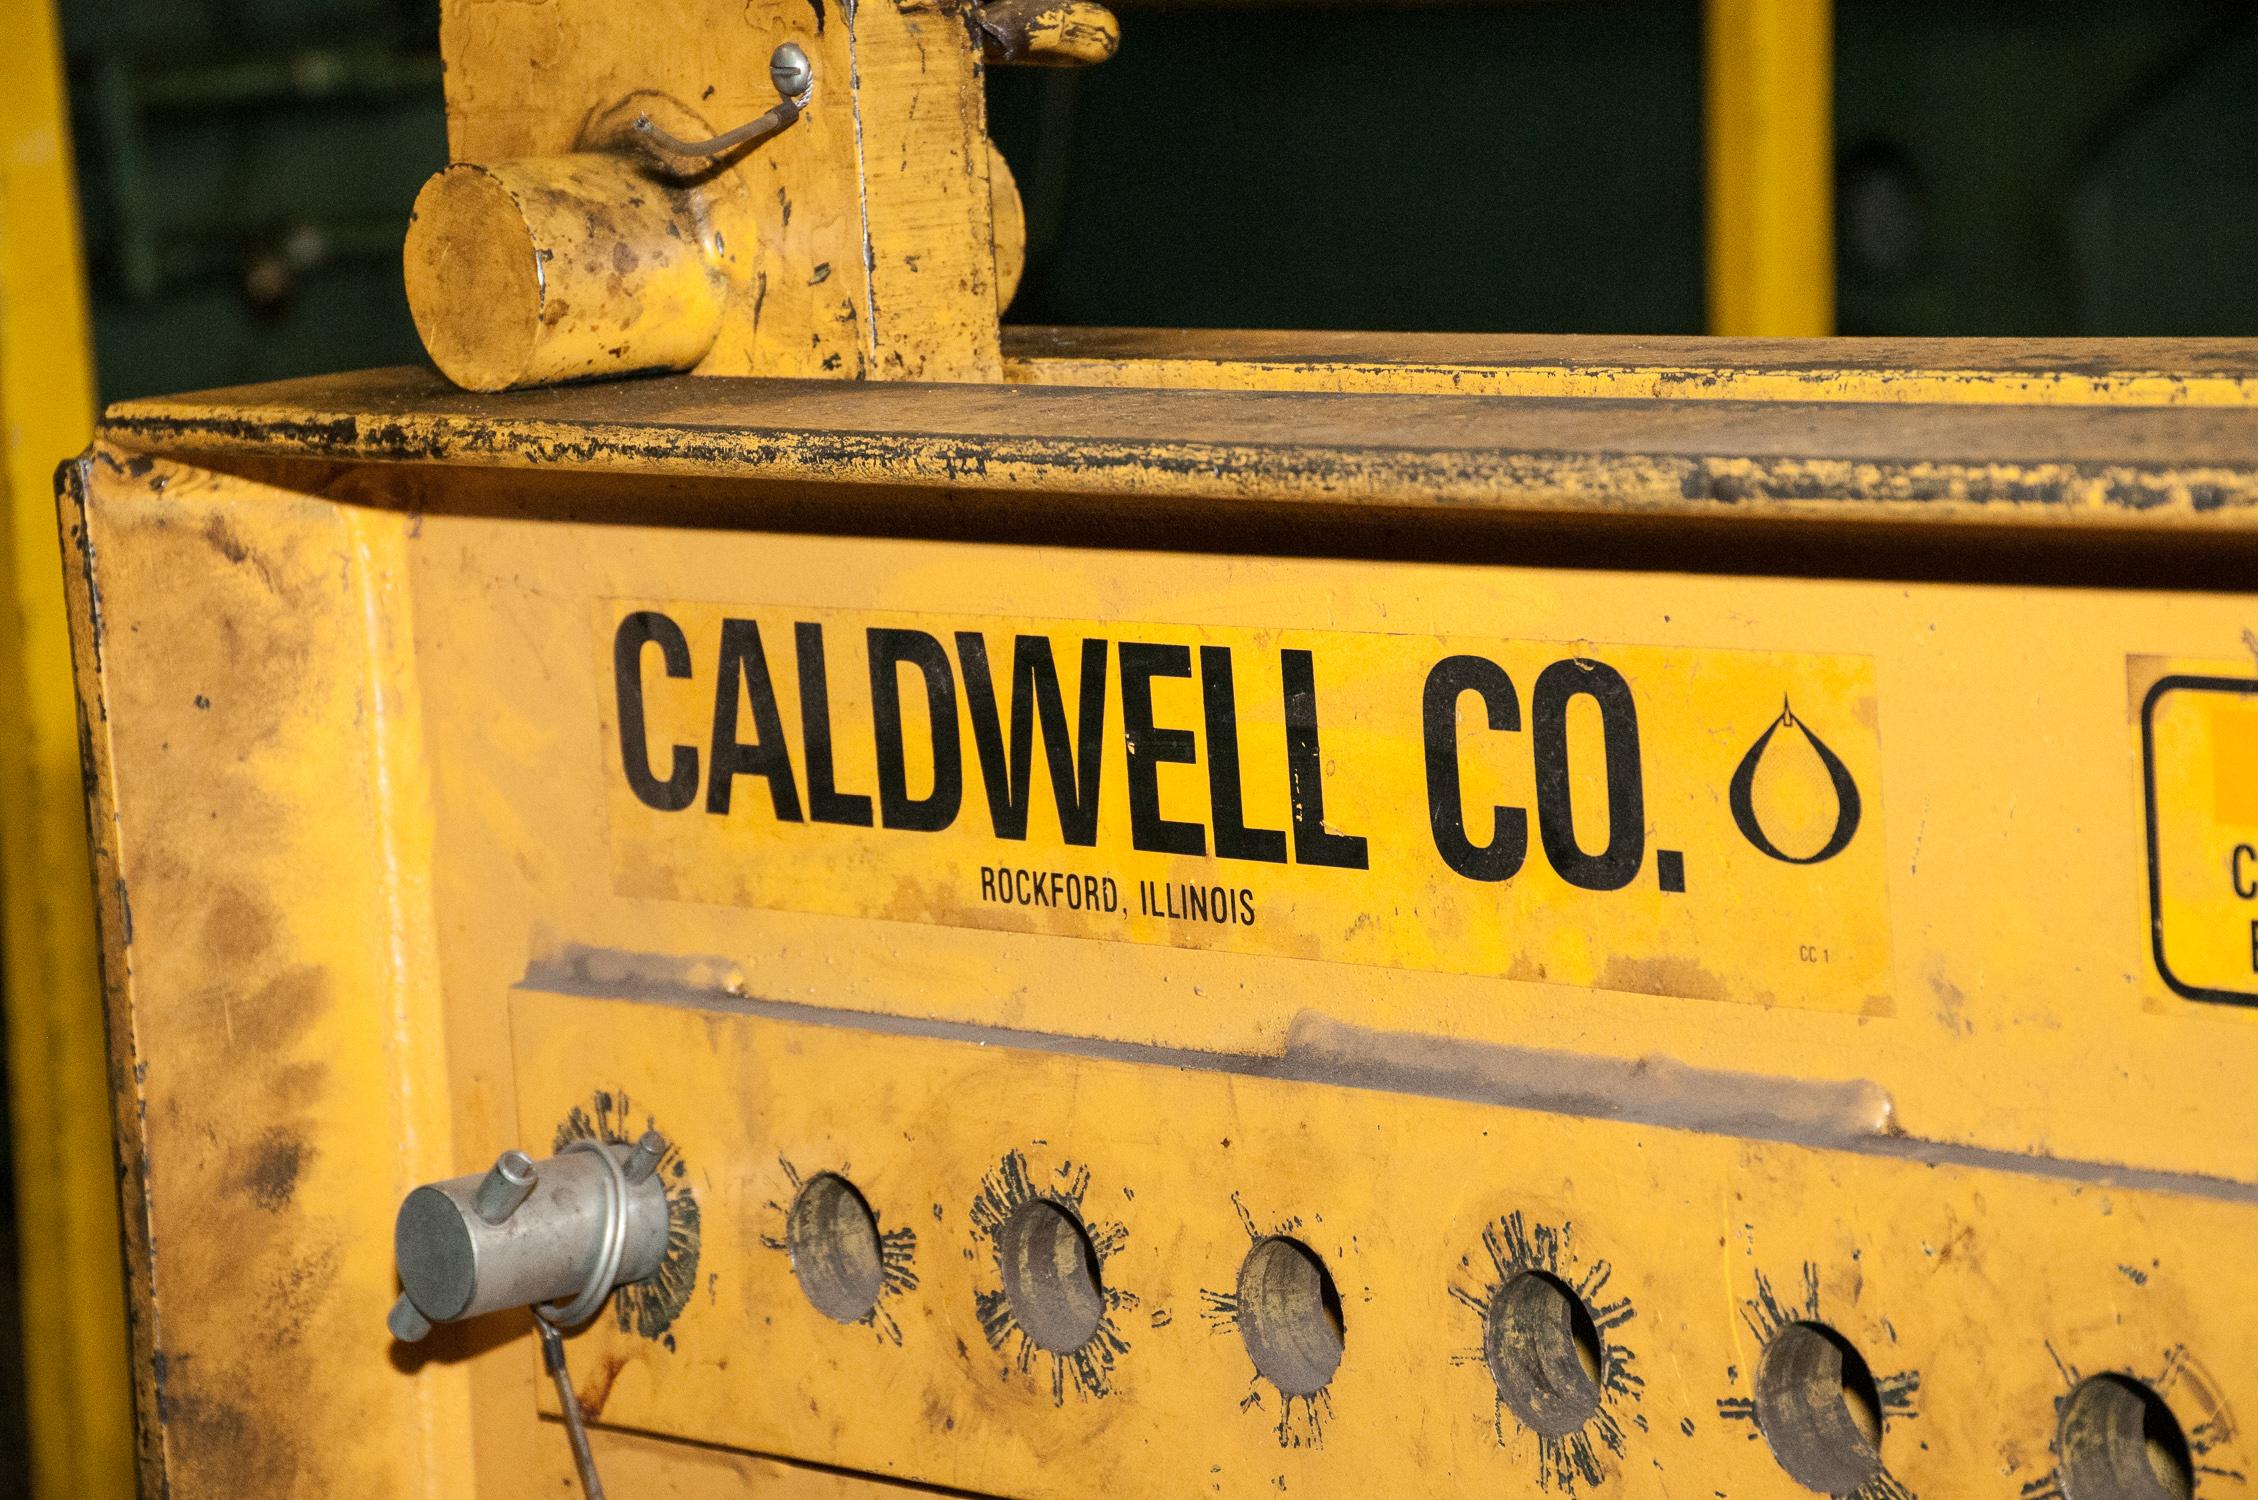 "Caldwell Co 30 Ton Spreader Bar adjustable 24""-72"" For Crane - Image 3 of 4"